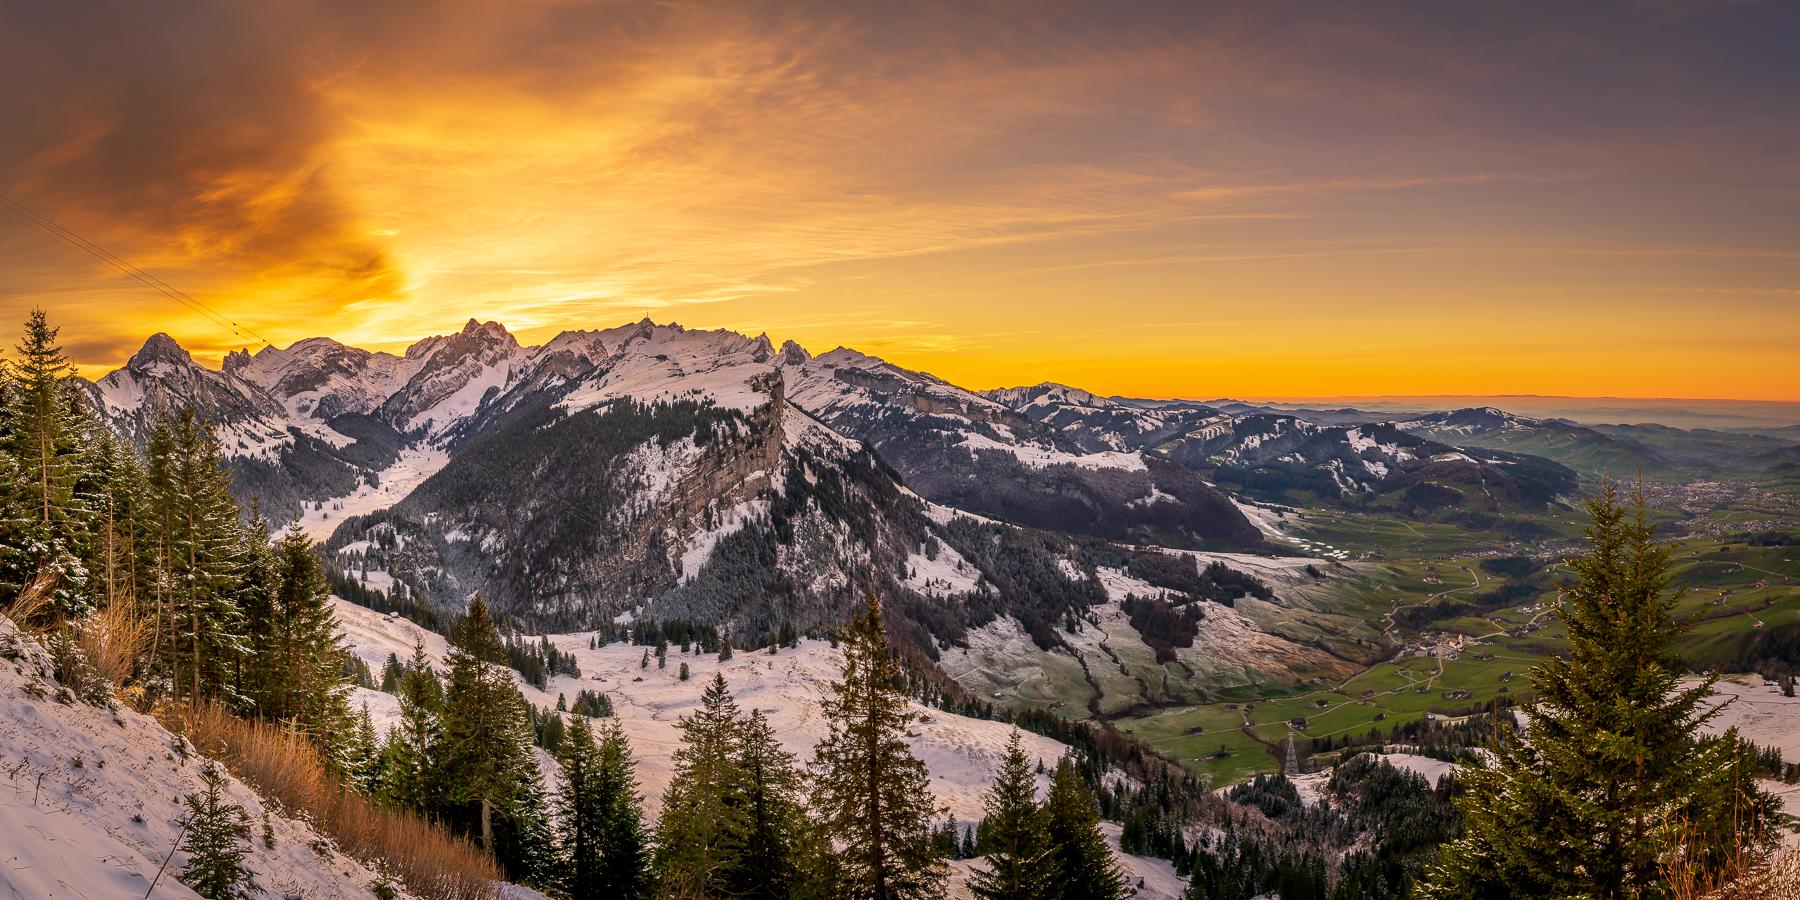 Bild Nr. 2020_9440: Alpsteinpanorama im Abendrot